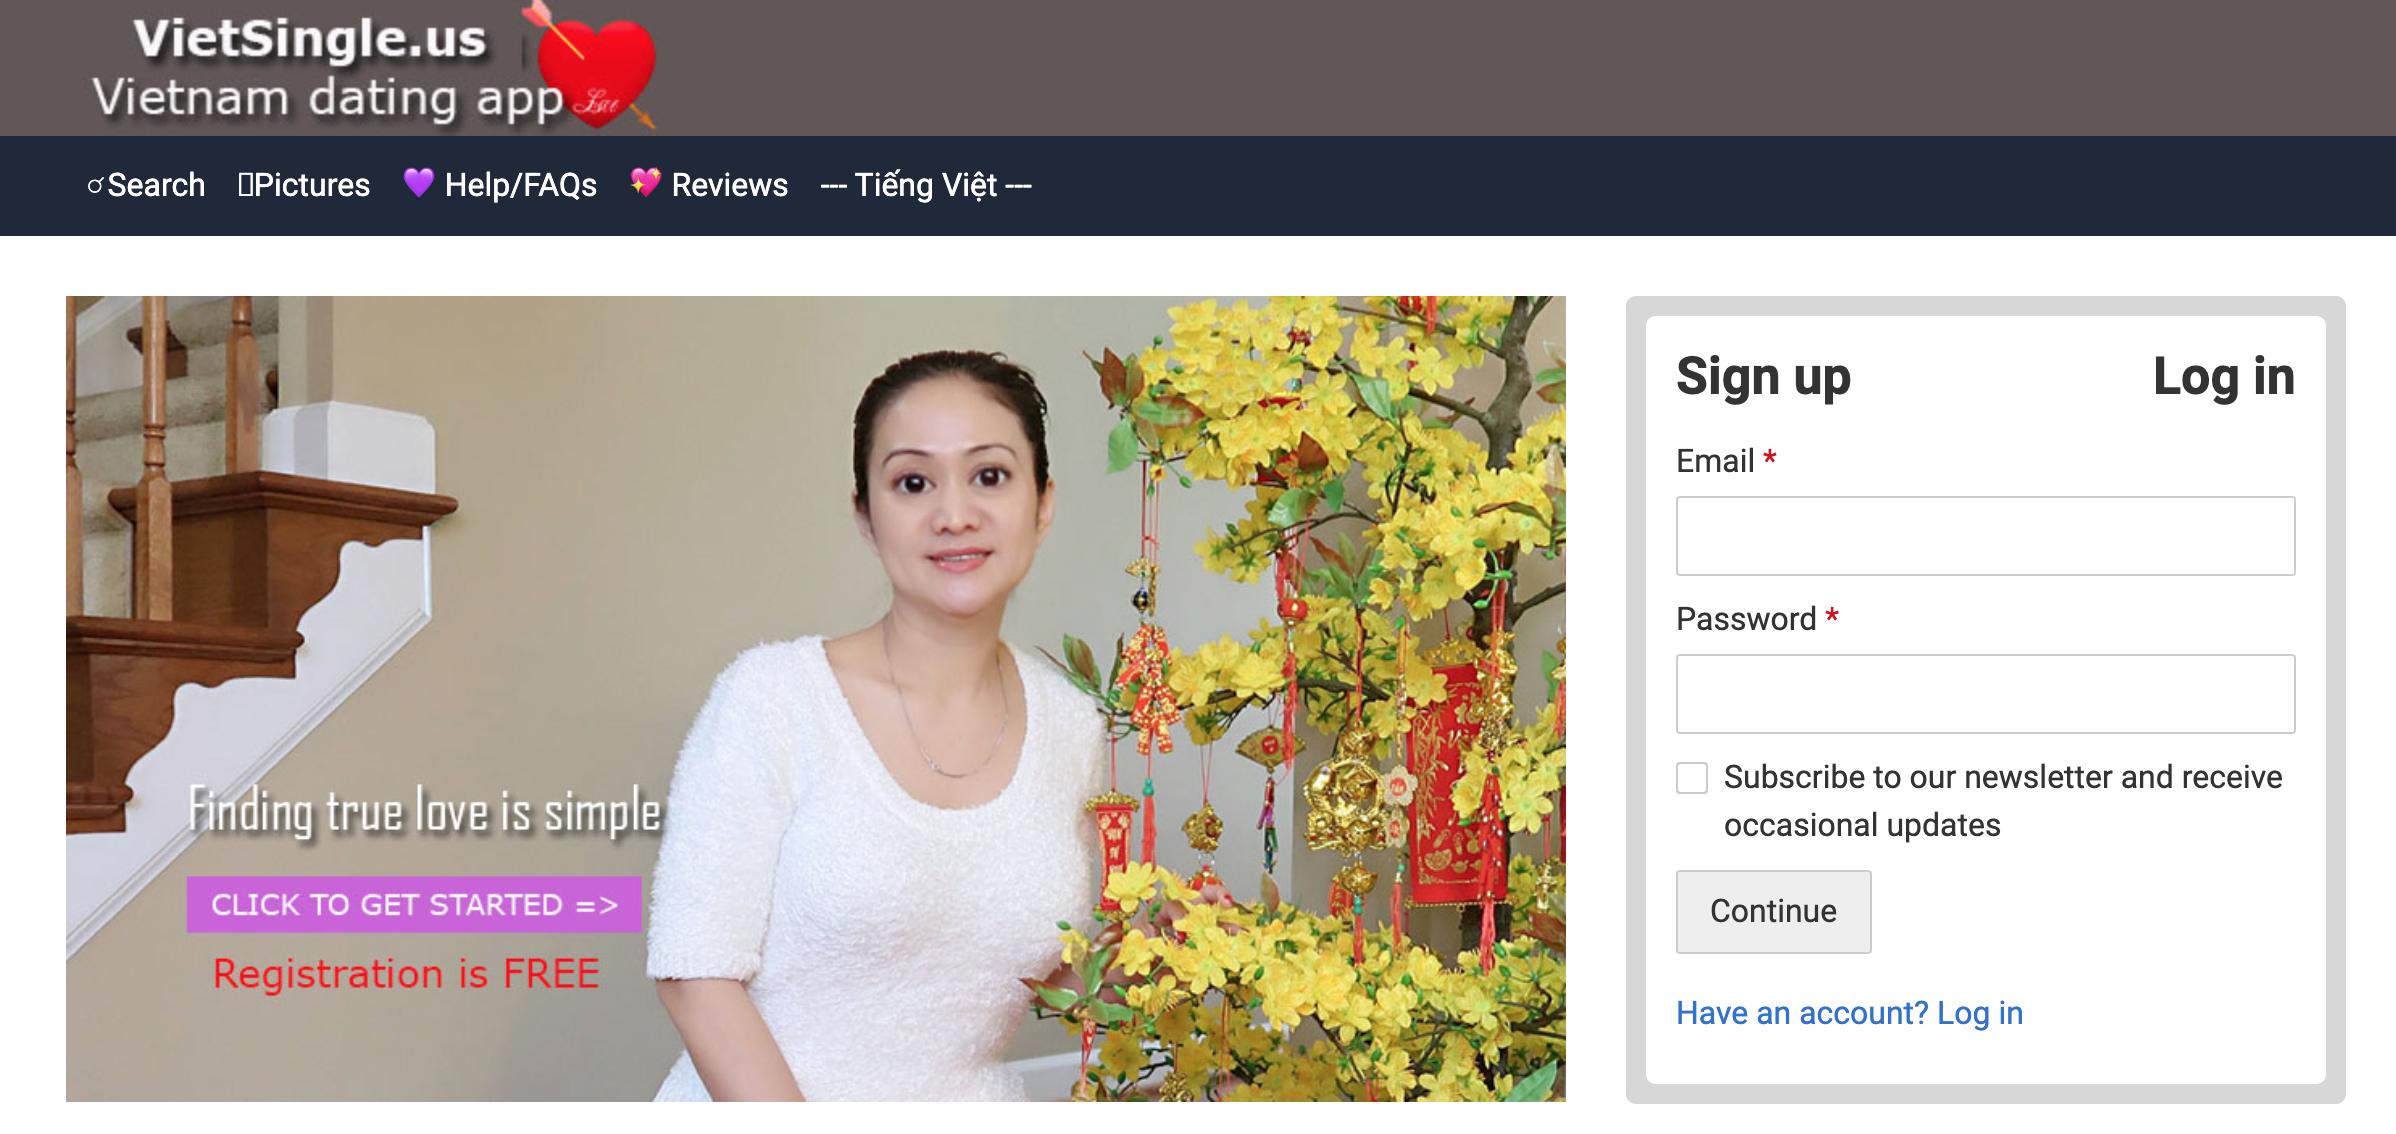 VietSingle.us main page